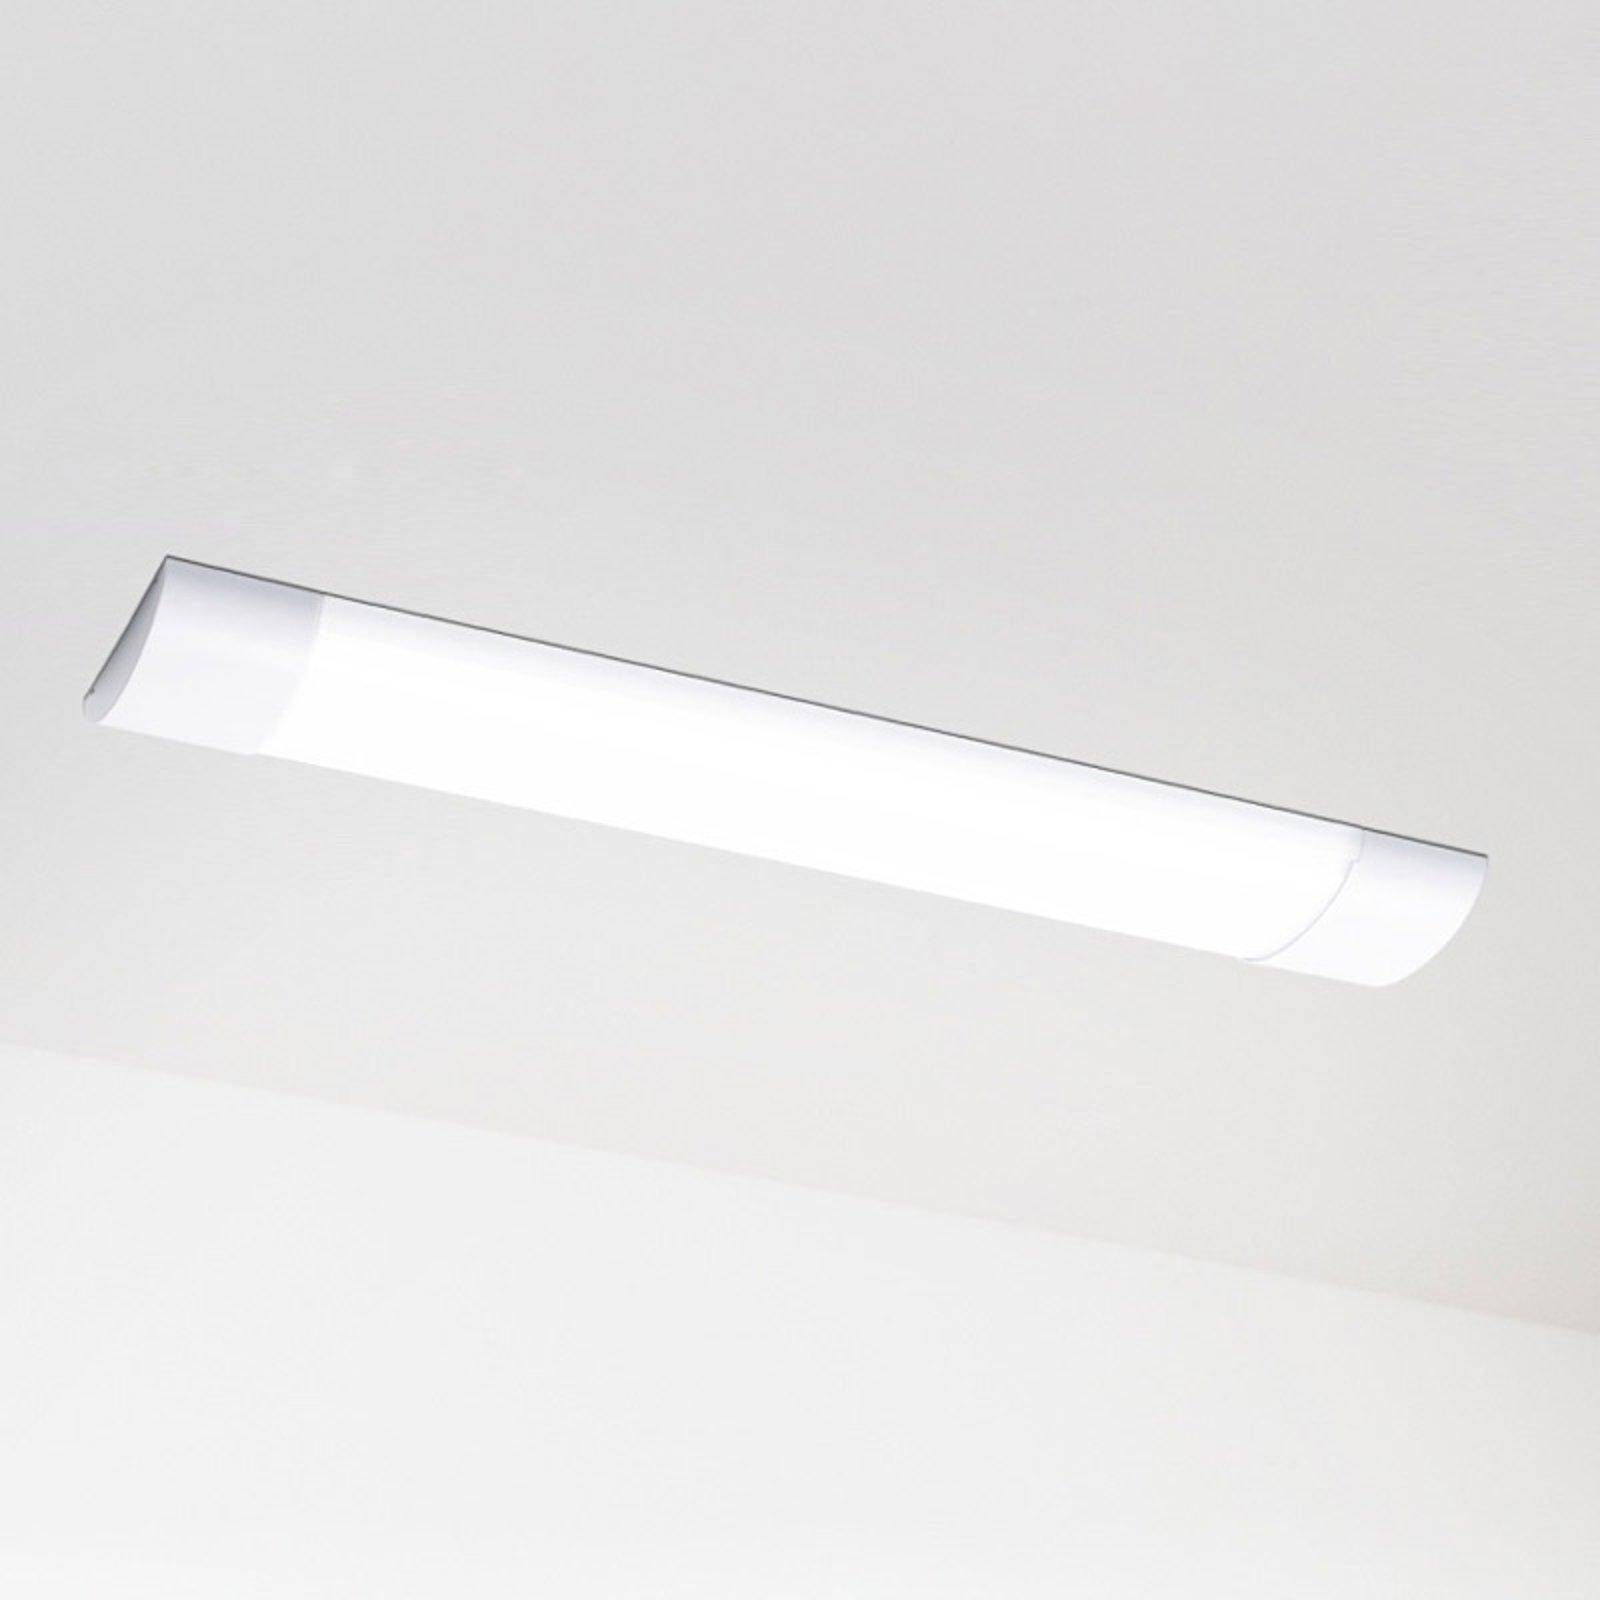 Scala Dim 60 LED-taklampe av aluminium